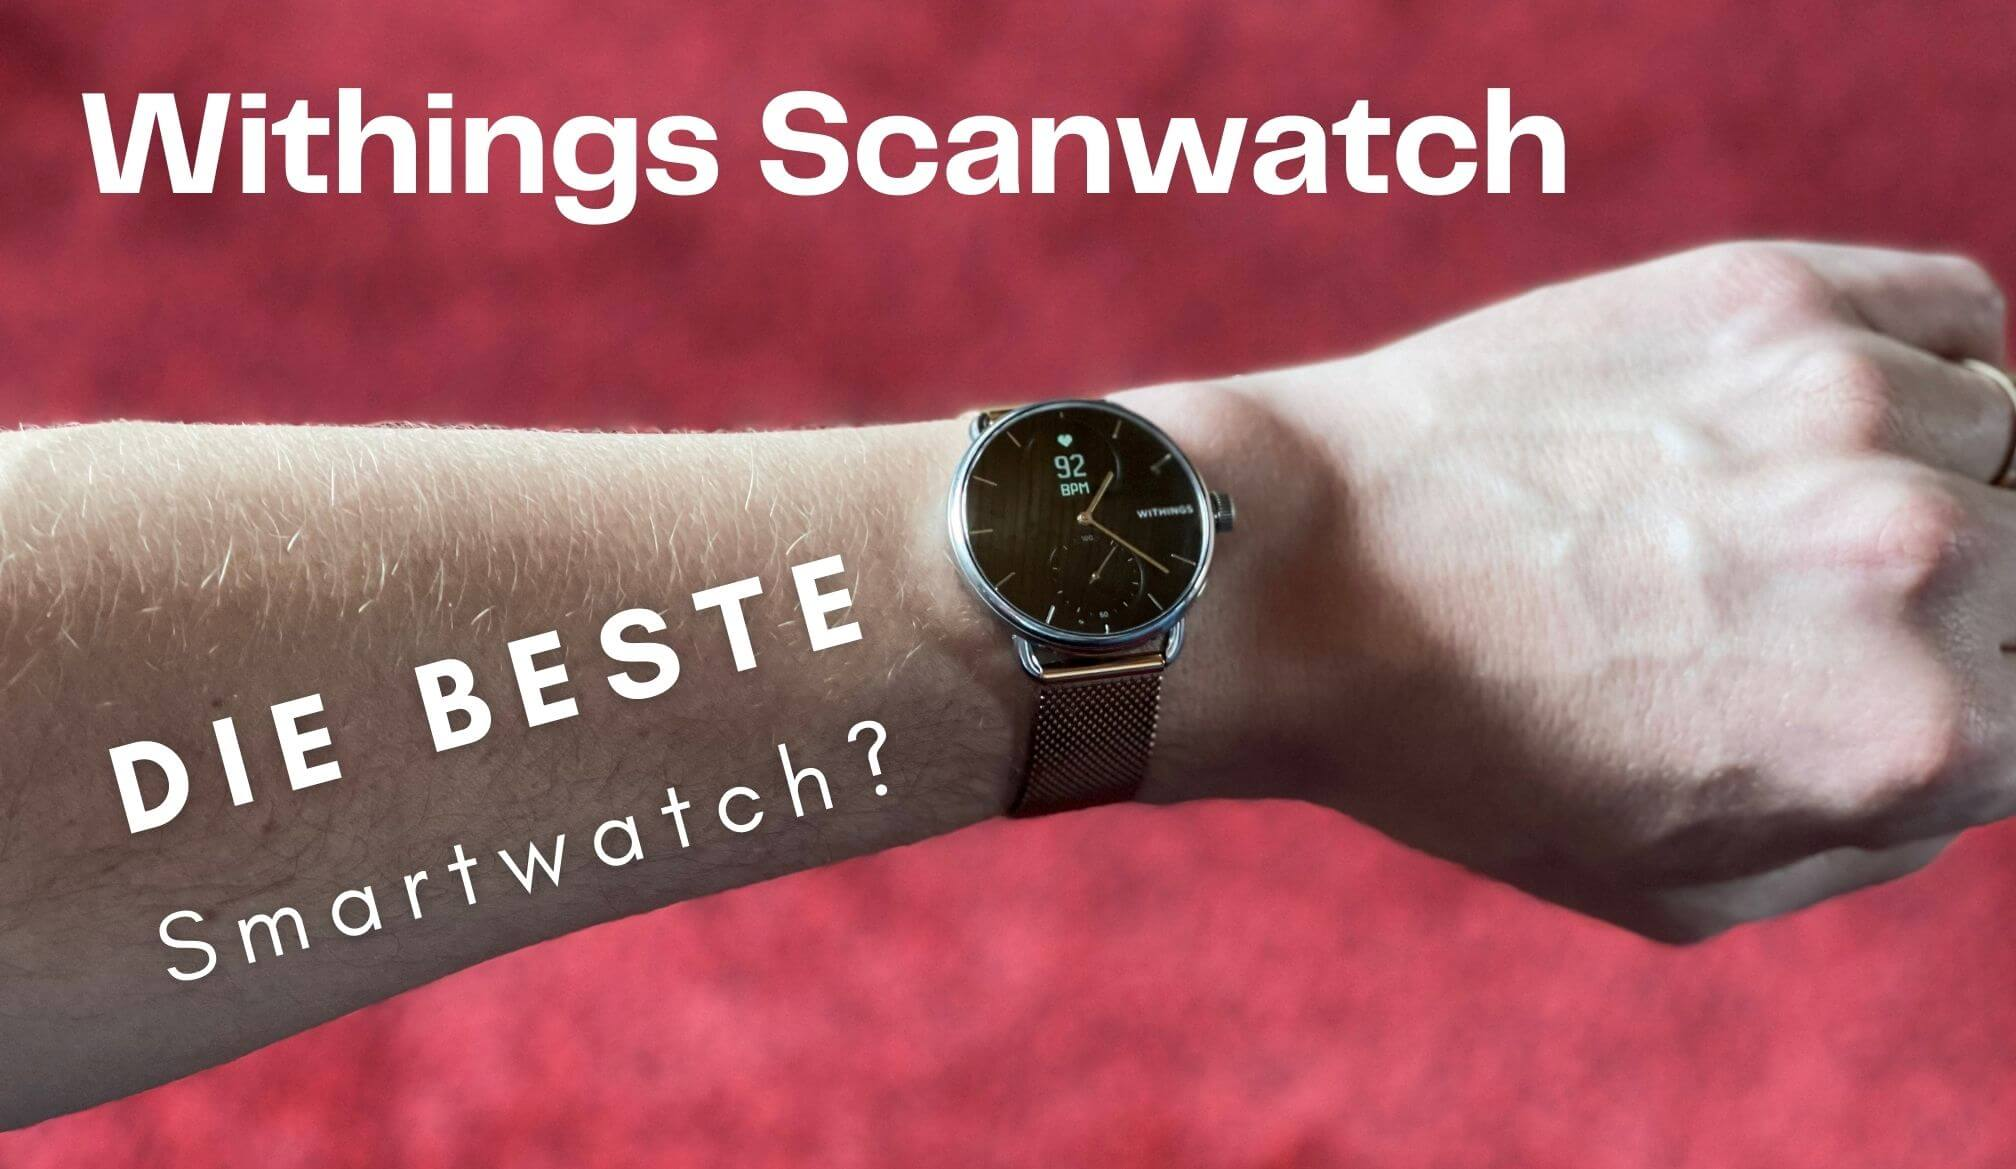 Withings Scanwatch Test – Das macht die Scanwatch besonders!